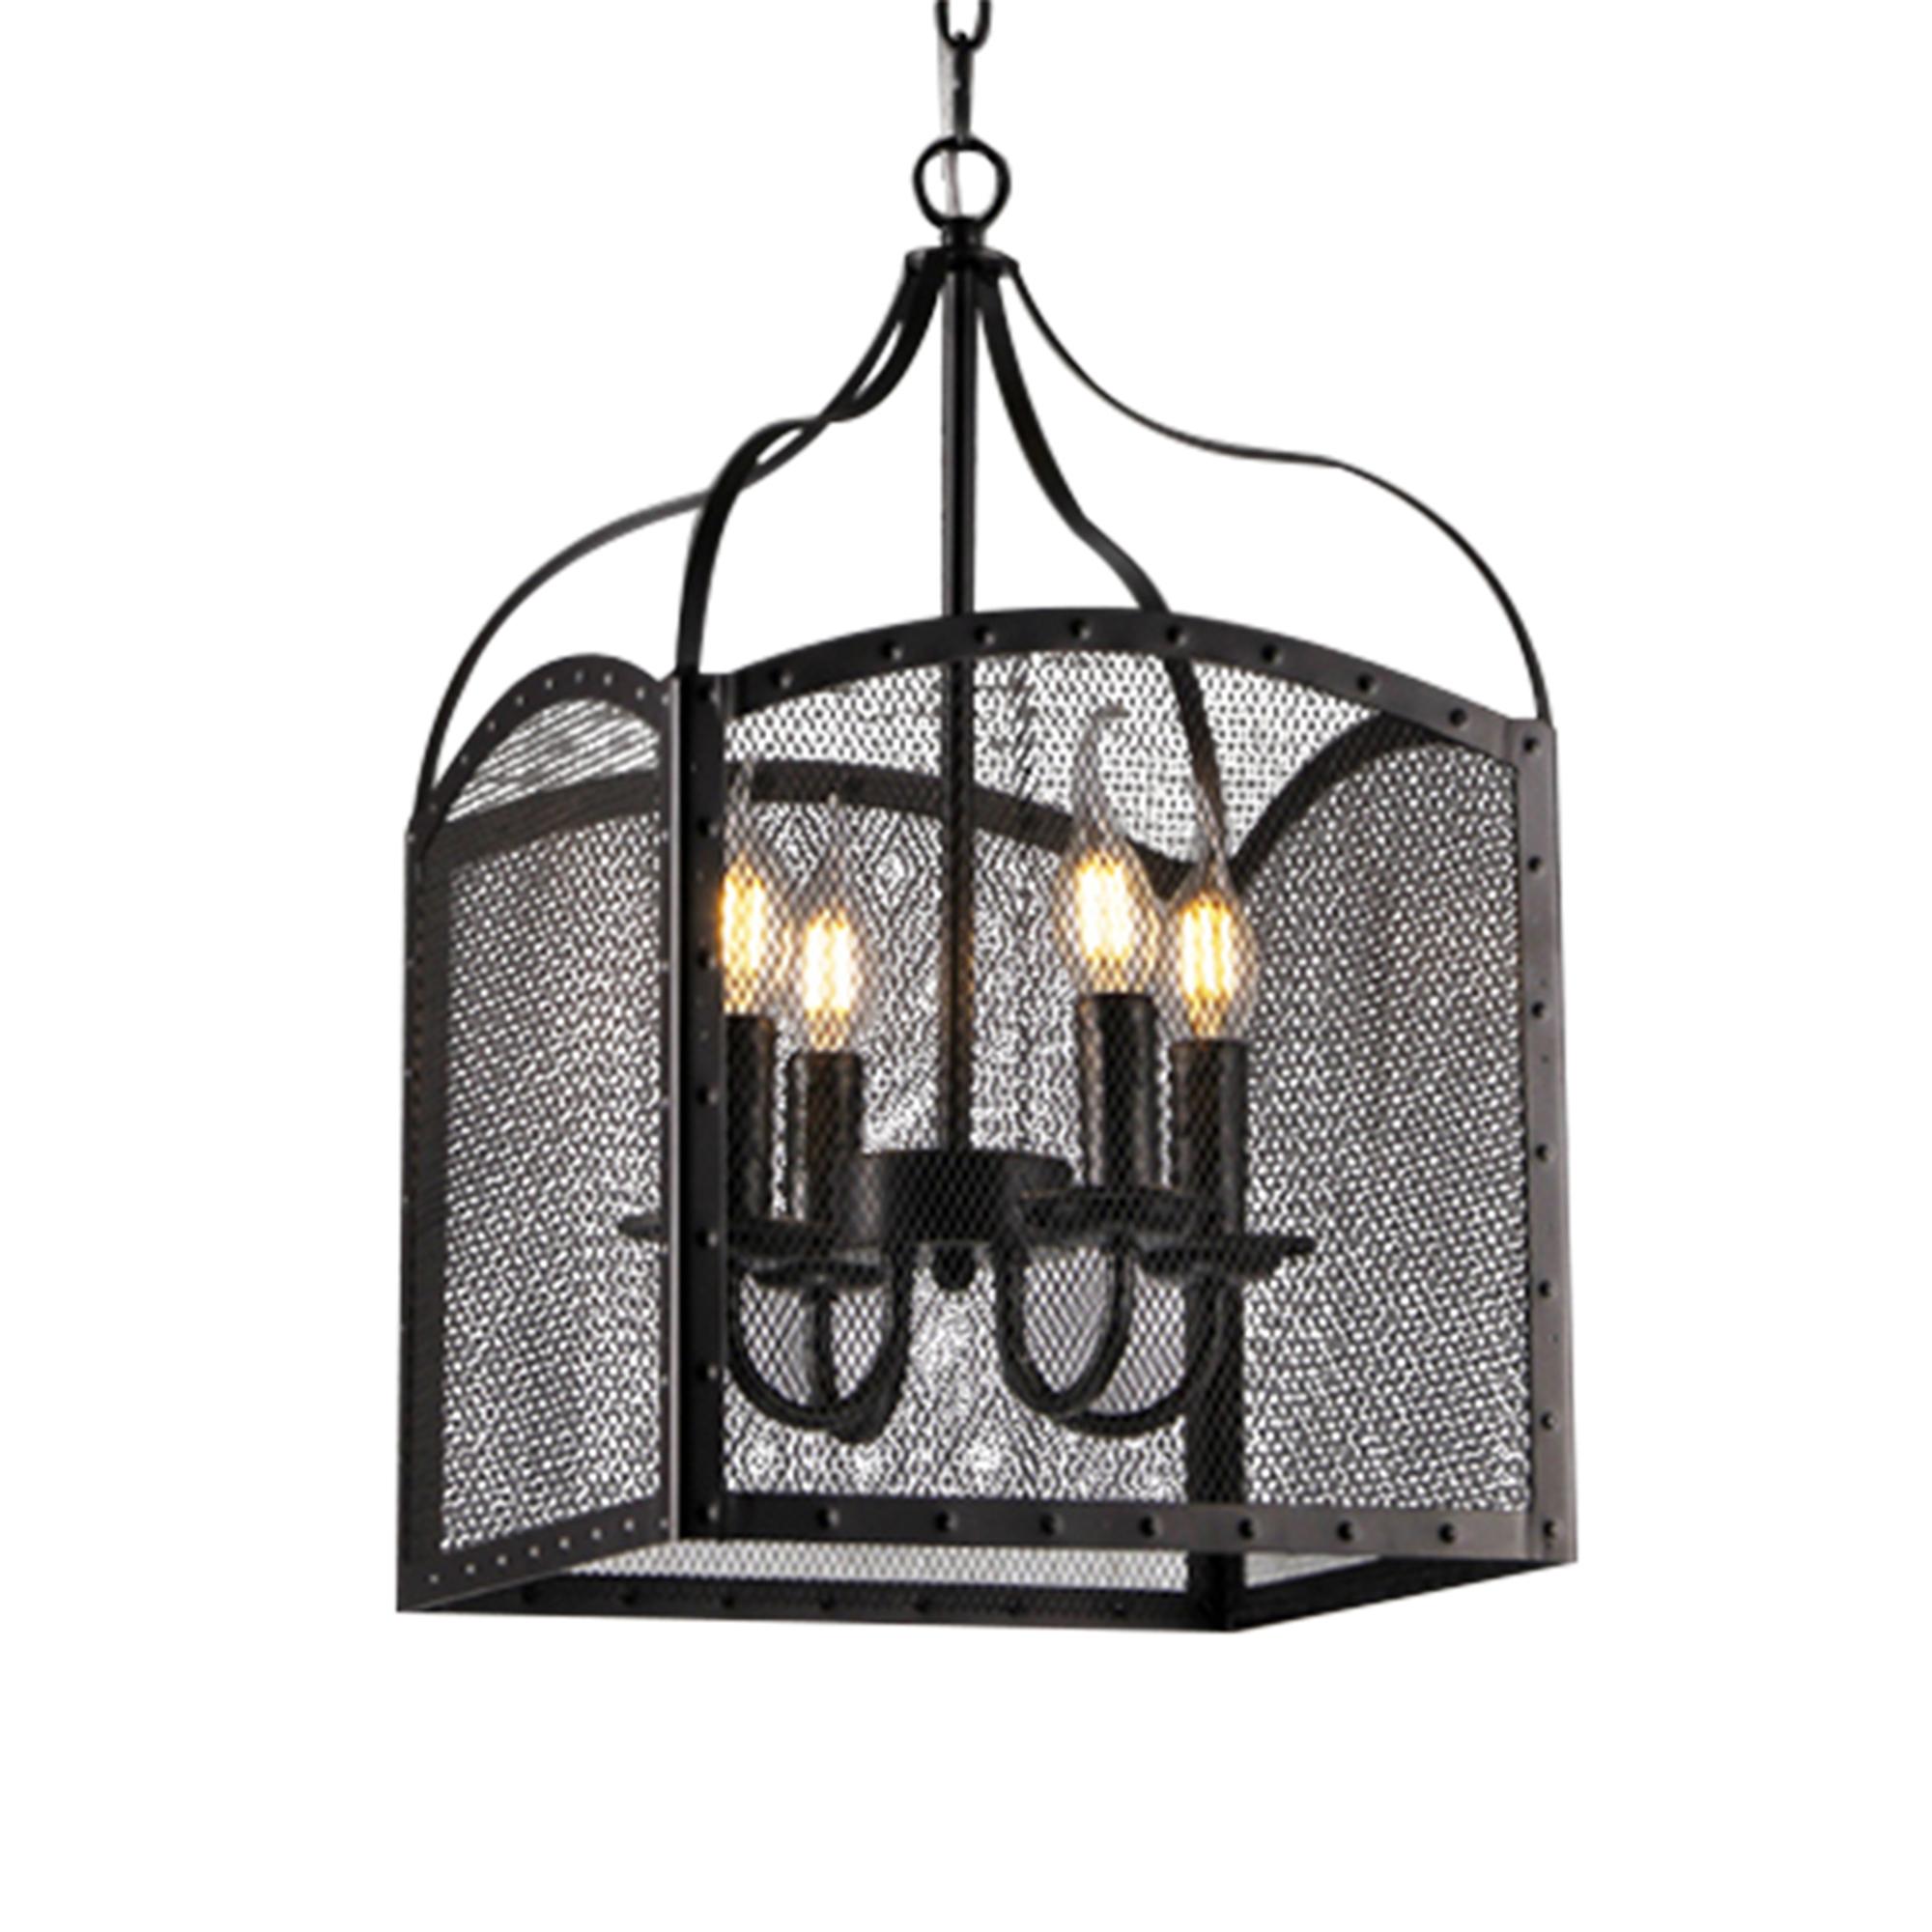 Cordelia Black 4-Light Pendant with Black shade